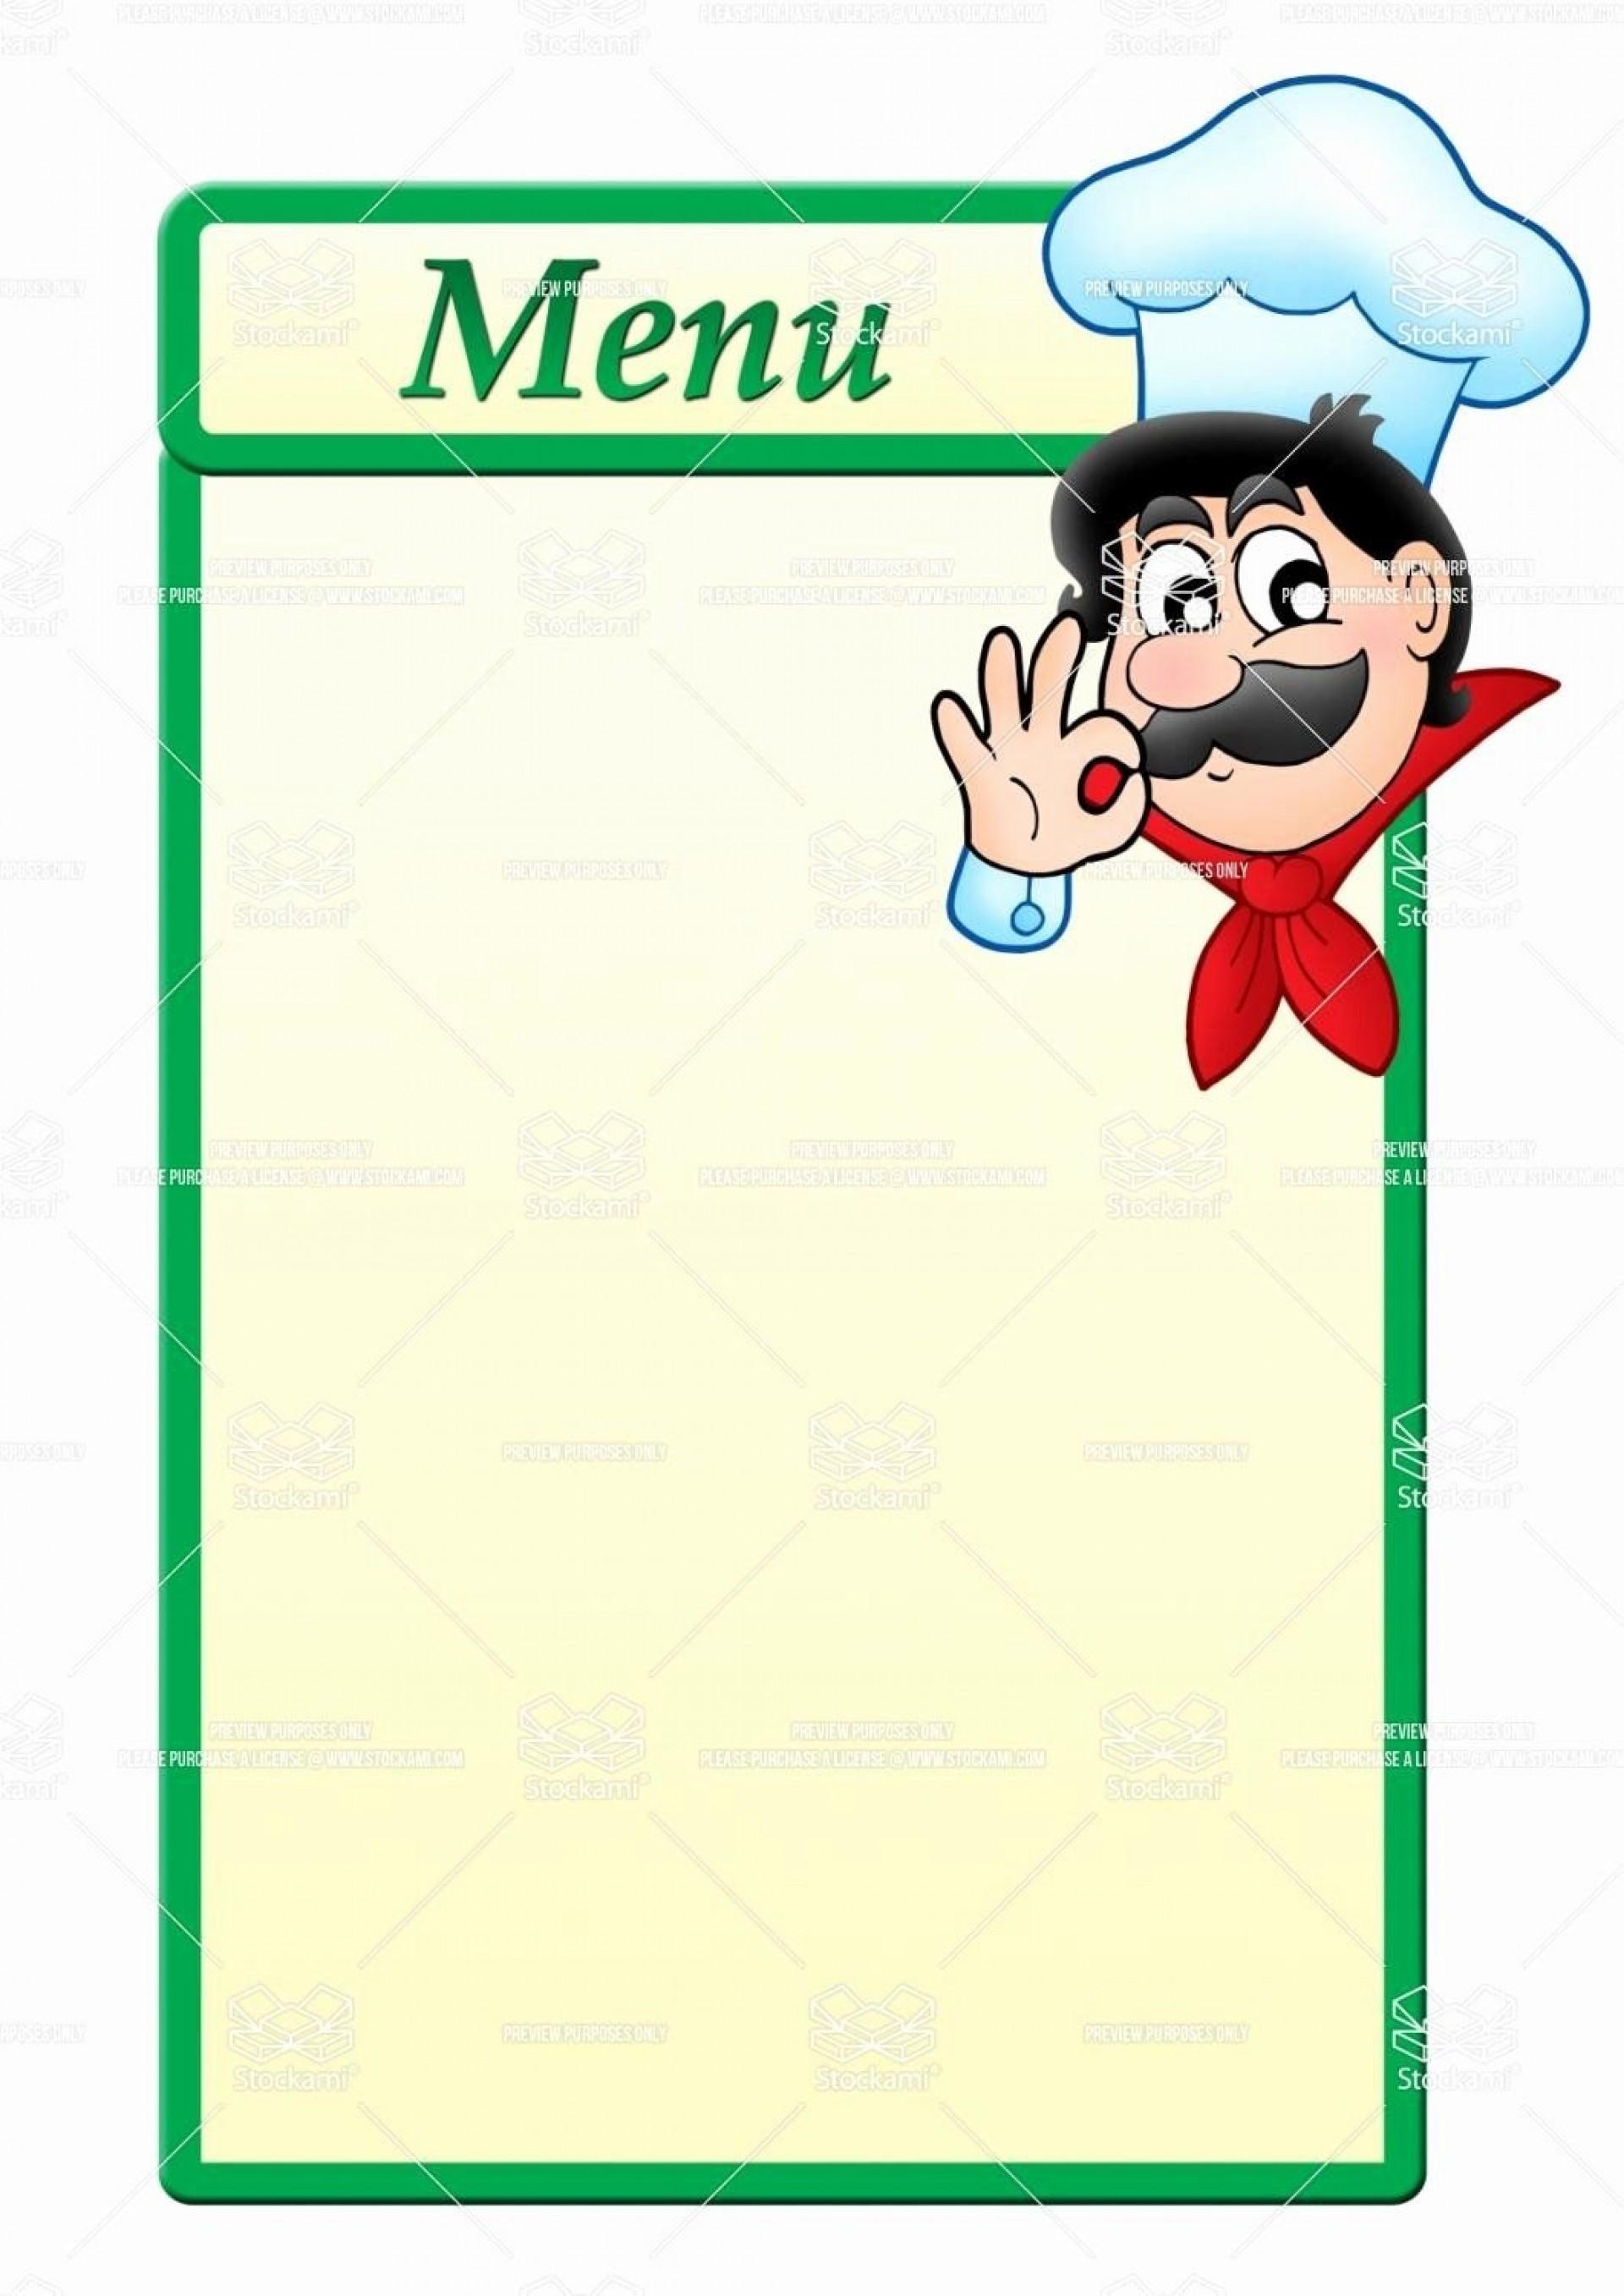 002 Simple Blank Restaurant Menu Template Photo  Free Printable Downloadable1920